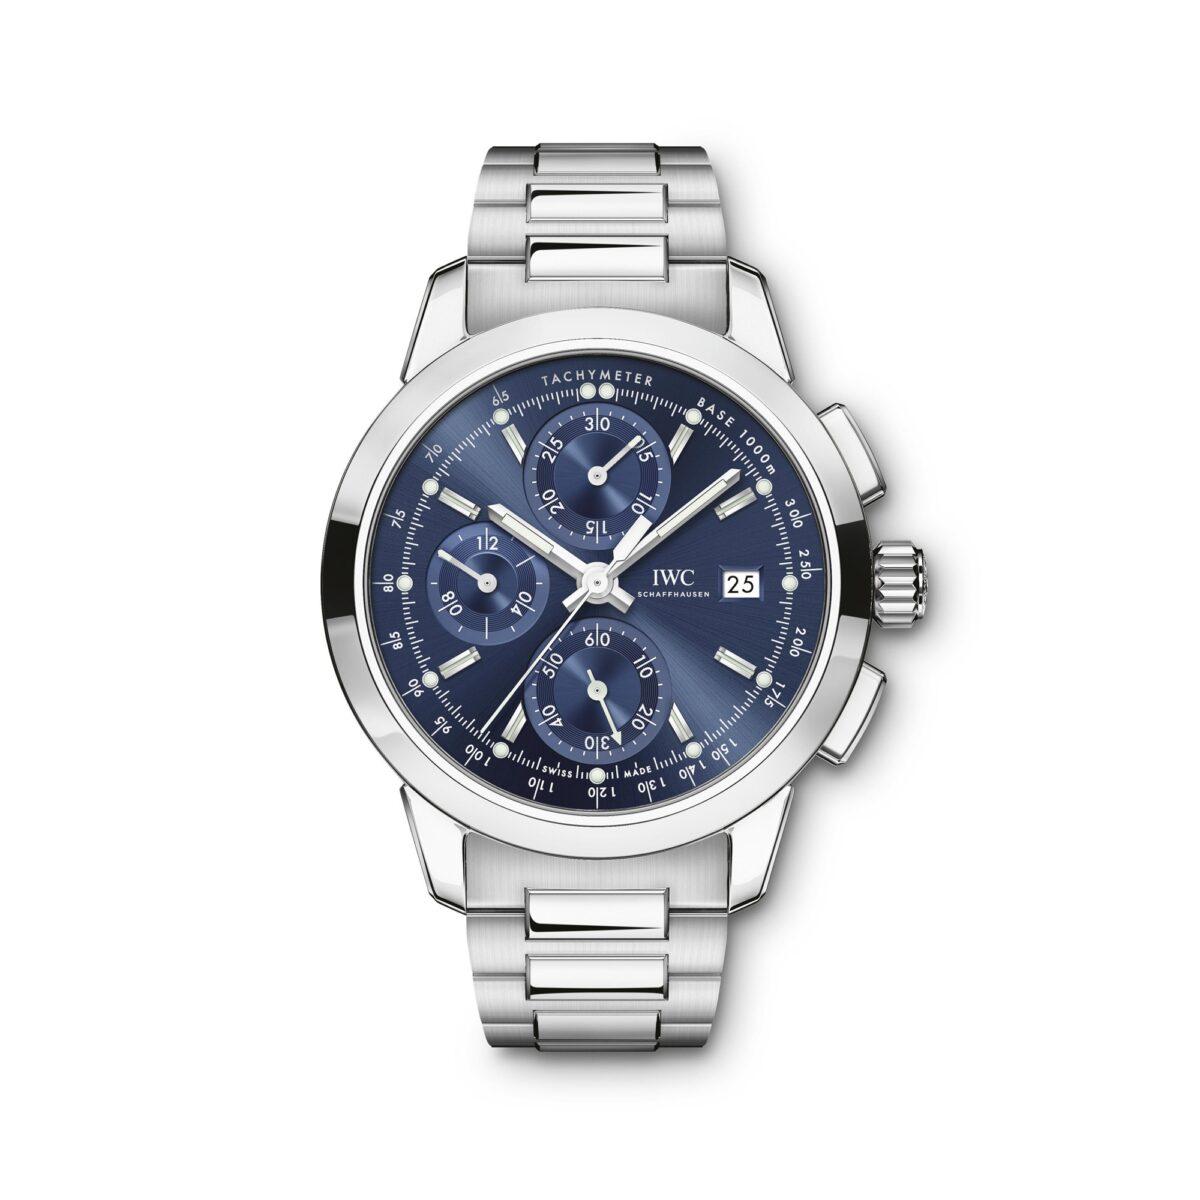 product/i/w/iw380802_ingenieur_chronograph_1529015.jpg